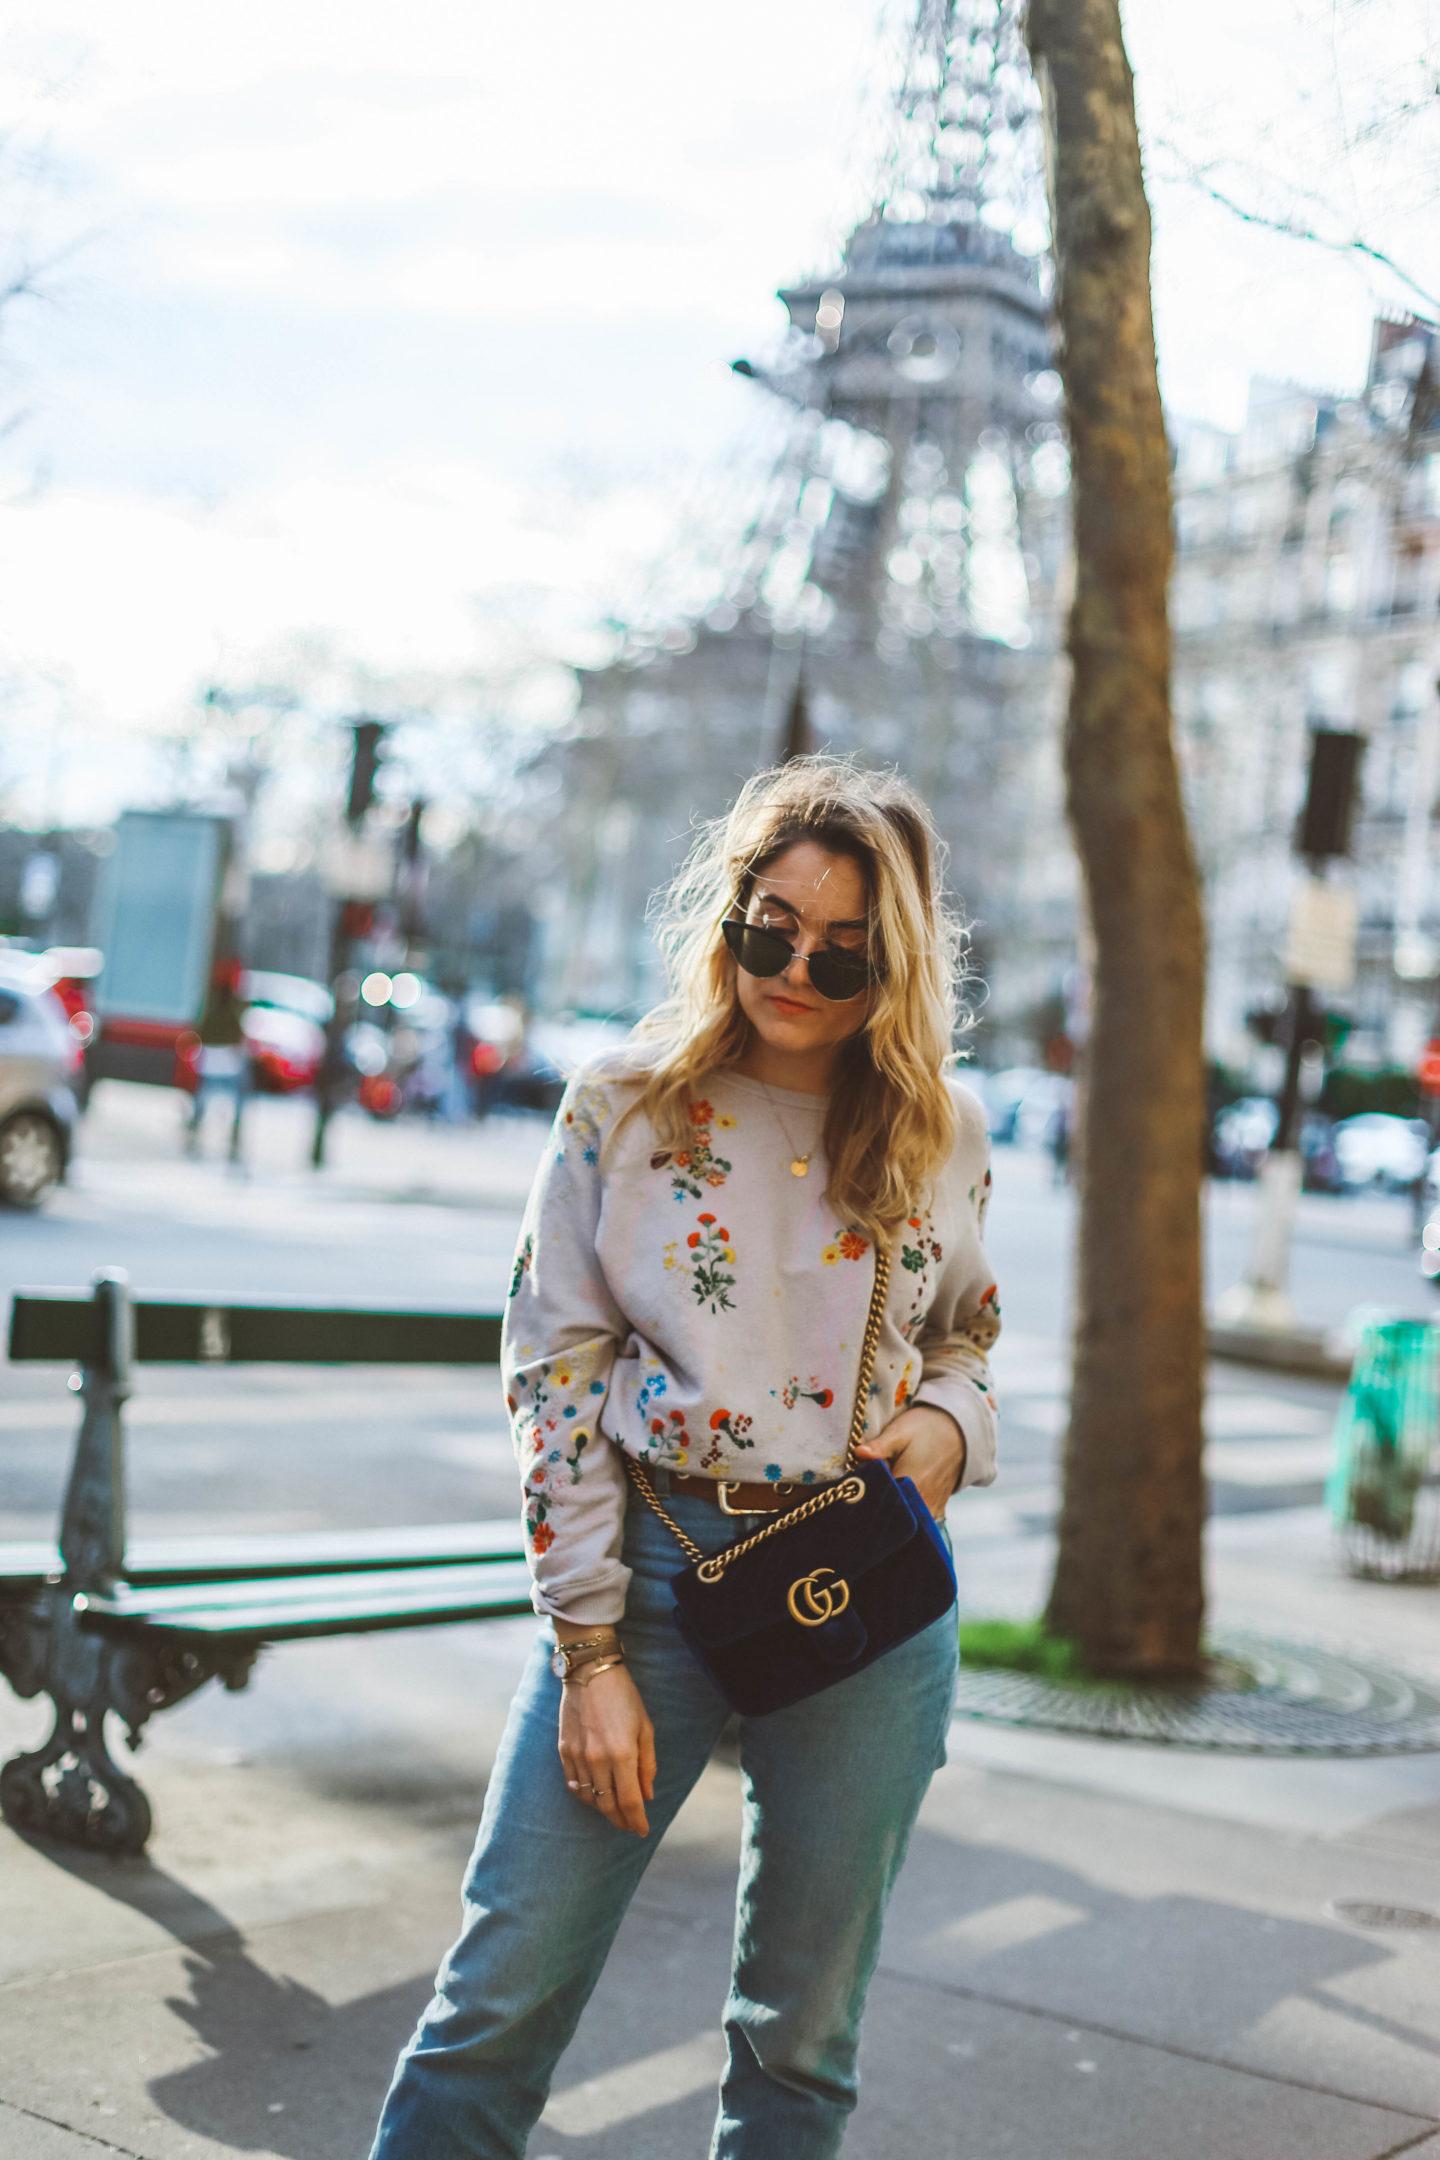 Sac Gucci - Blondie Baby blog mode et voyages